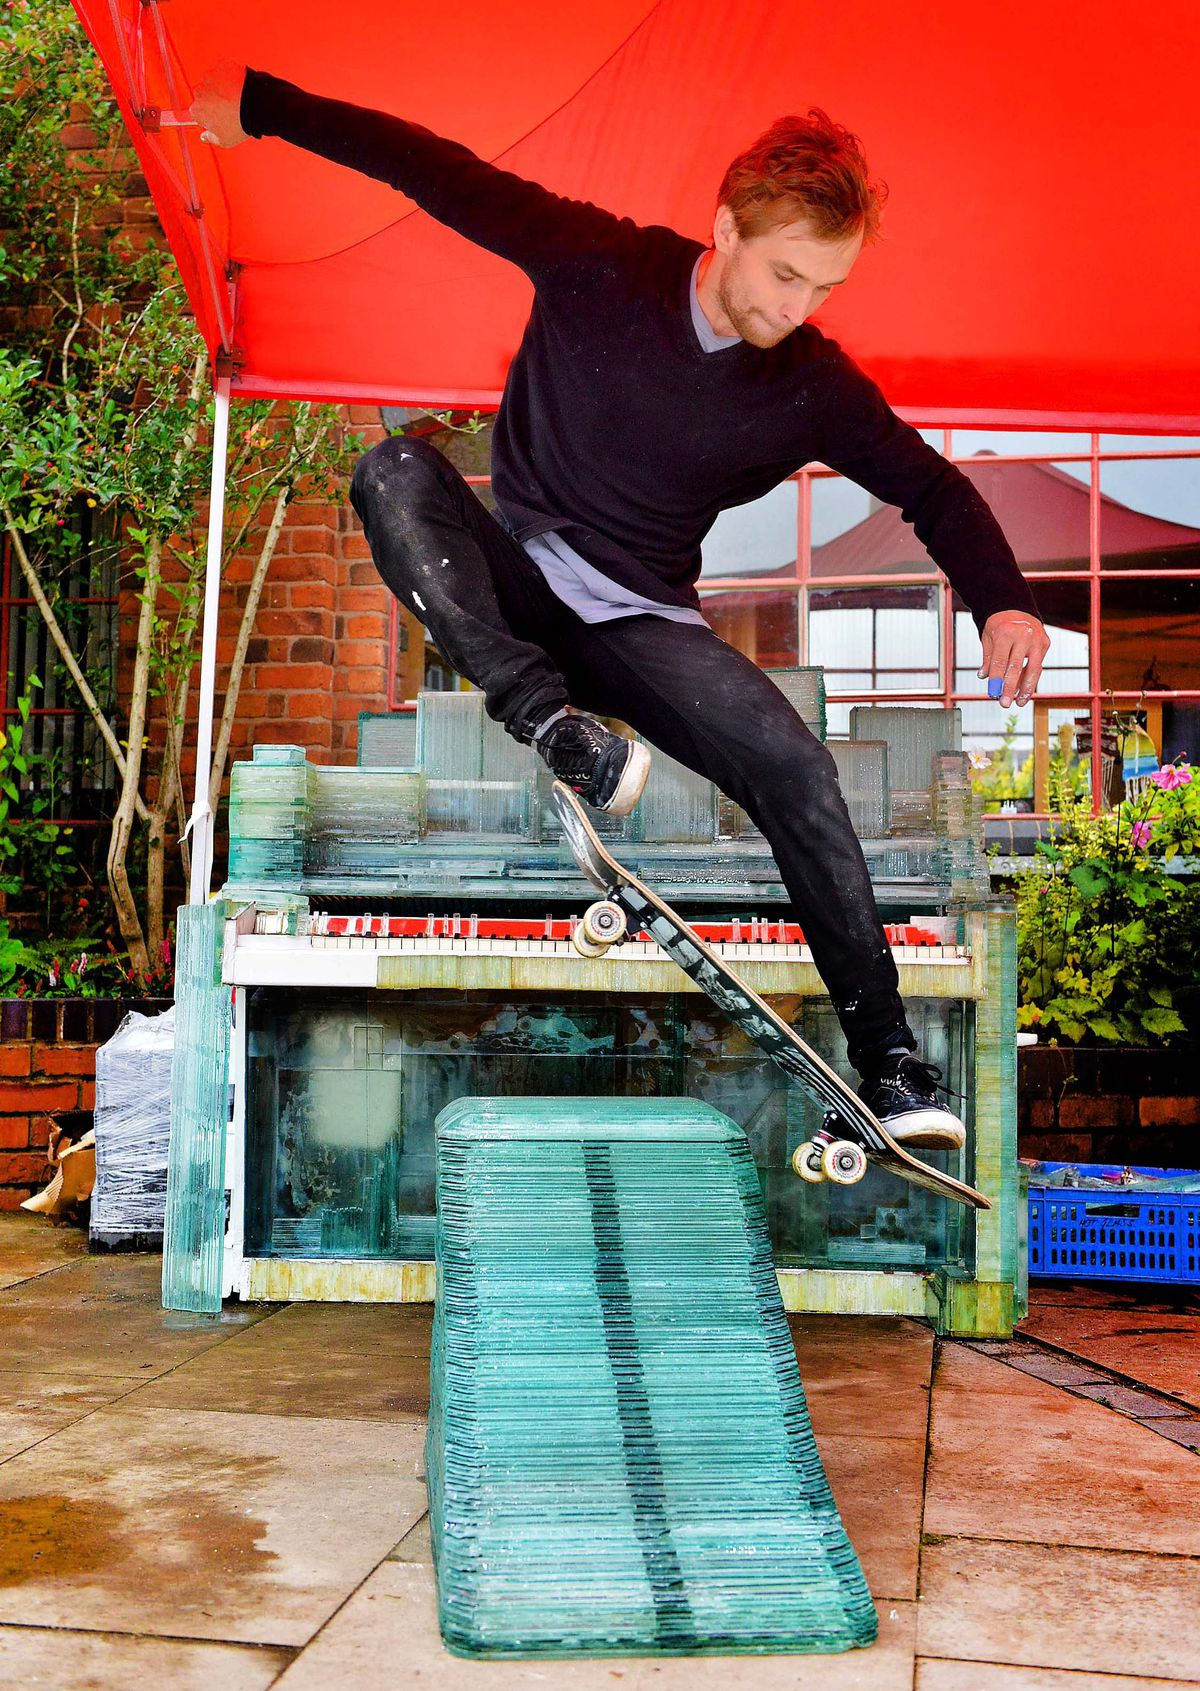 As well as being an artist, Kārlis is a talented skateboarder